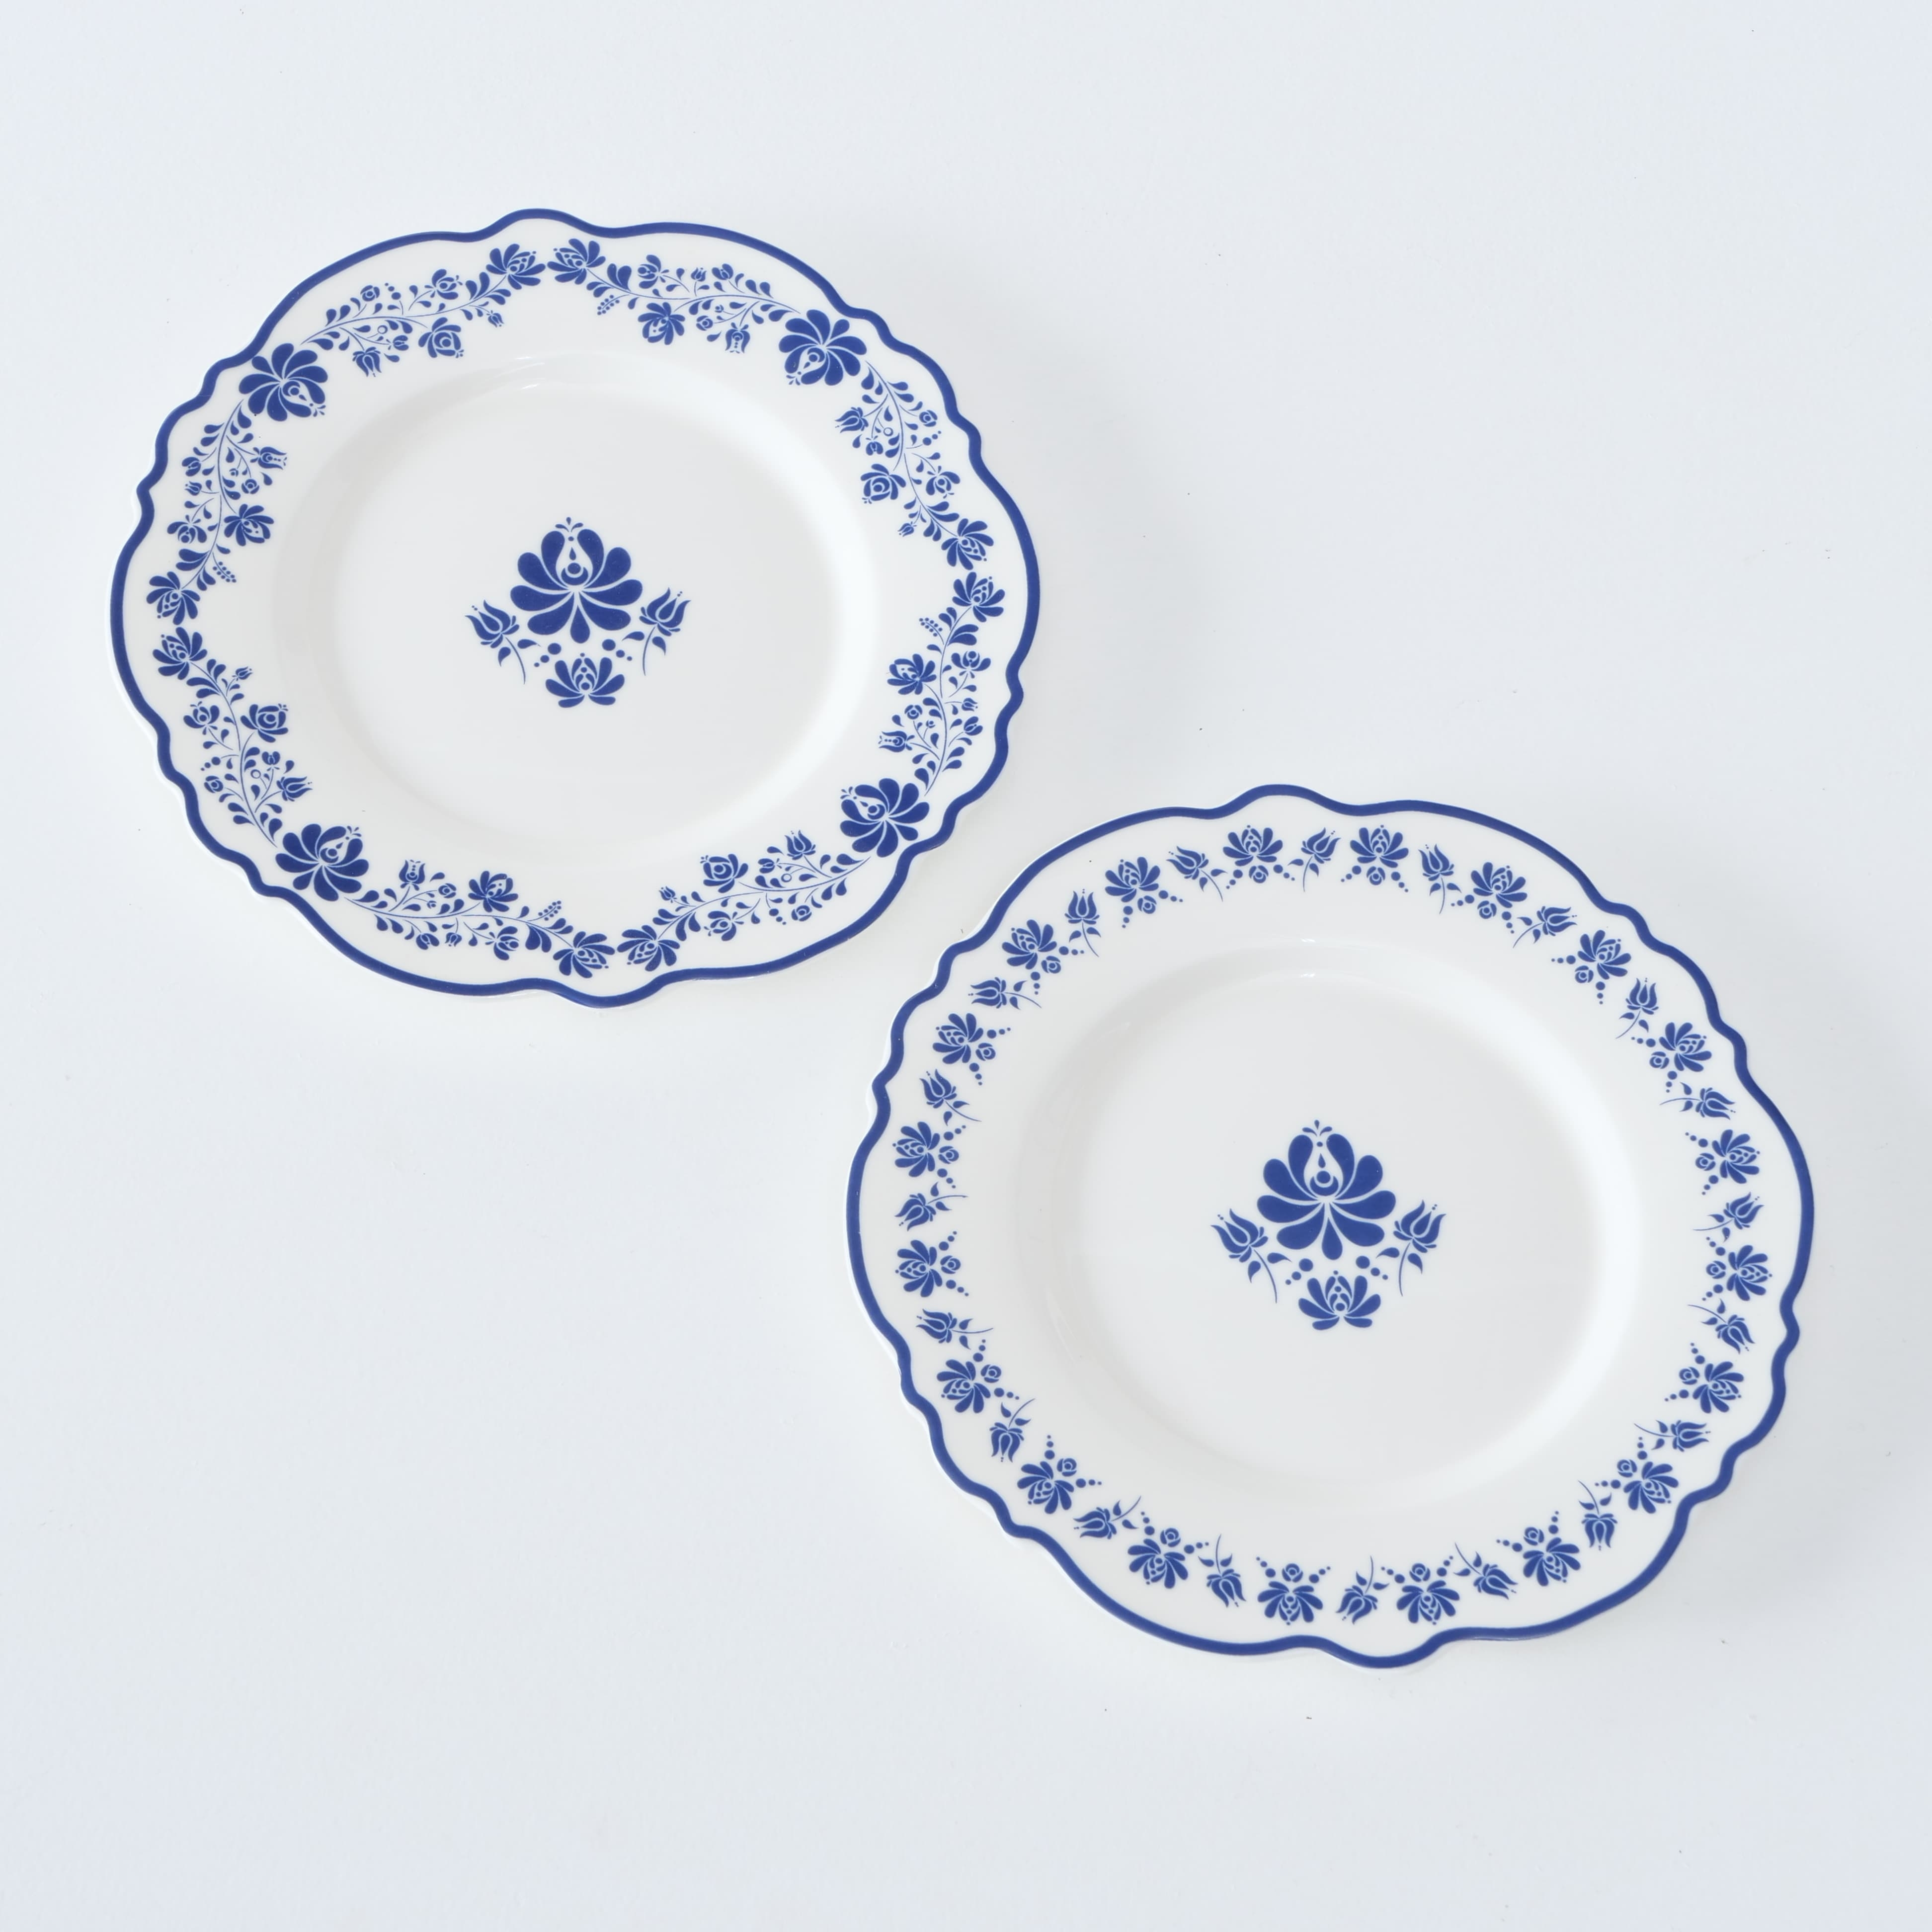 Farfurie intinsa din ceramica Megan Alb / Albastru, Modele Asortate, 19 cm poza